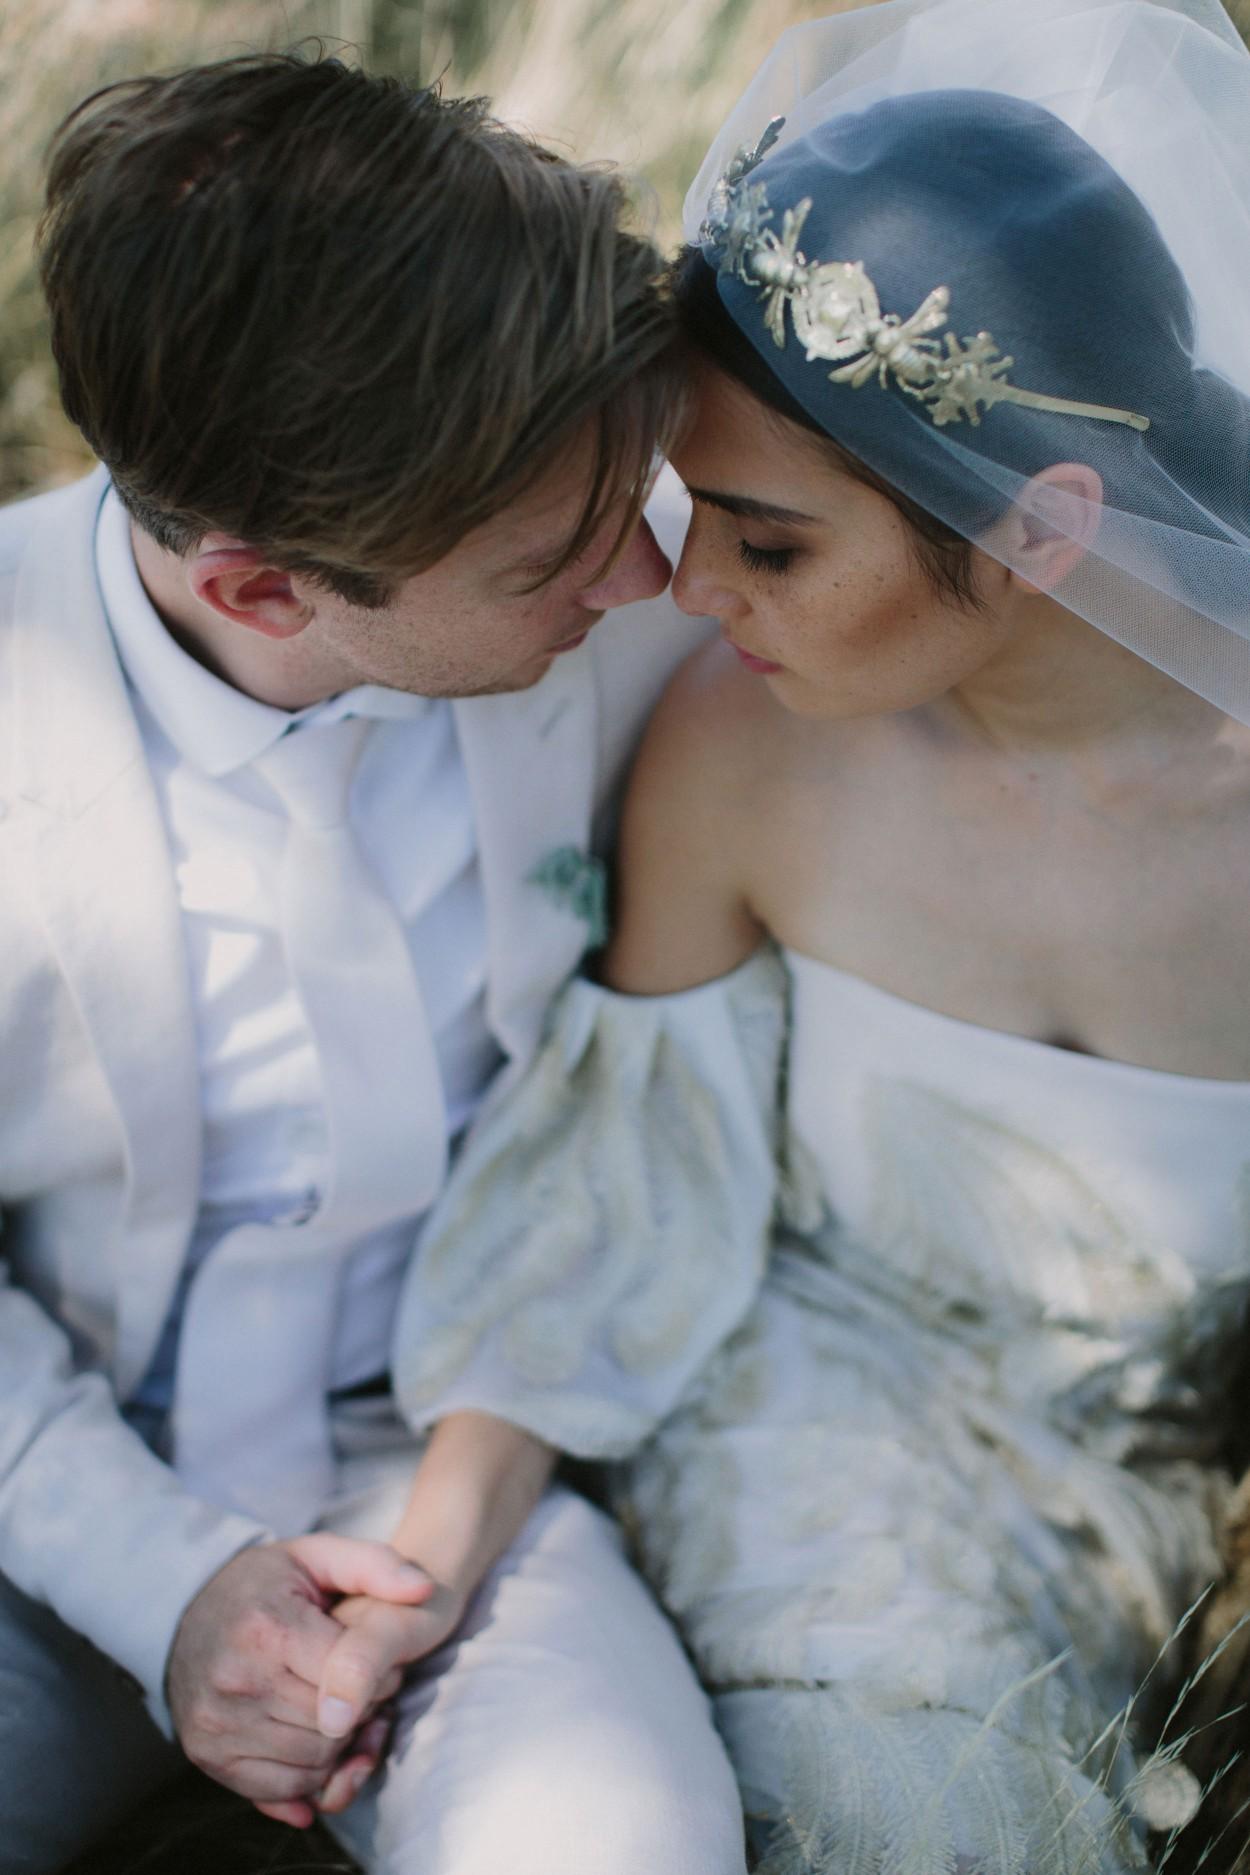 I-Got-You-Babe-Weddings-Heide-Museum-of-Modern-Art-Elopement-Susie-Nathan093.jpg